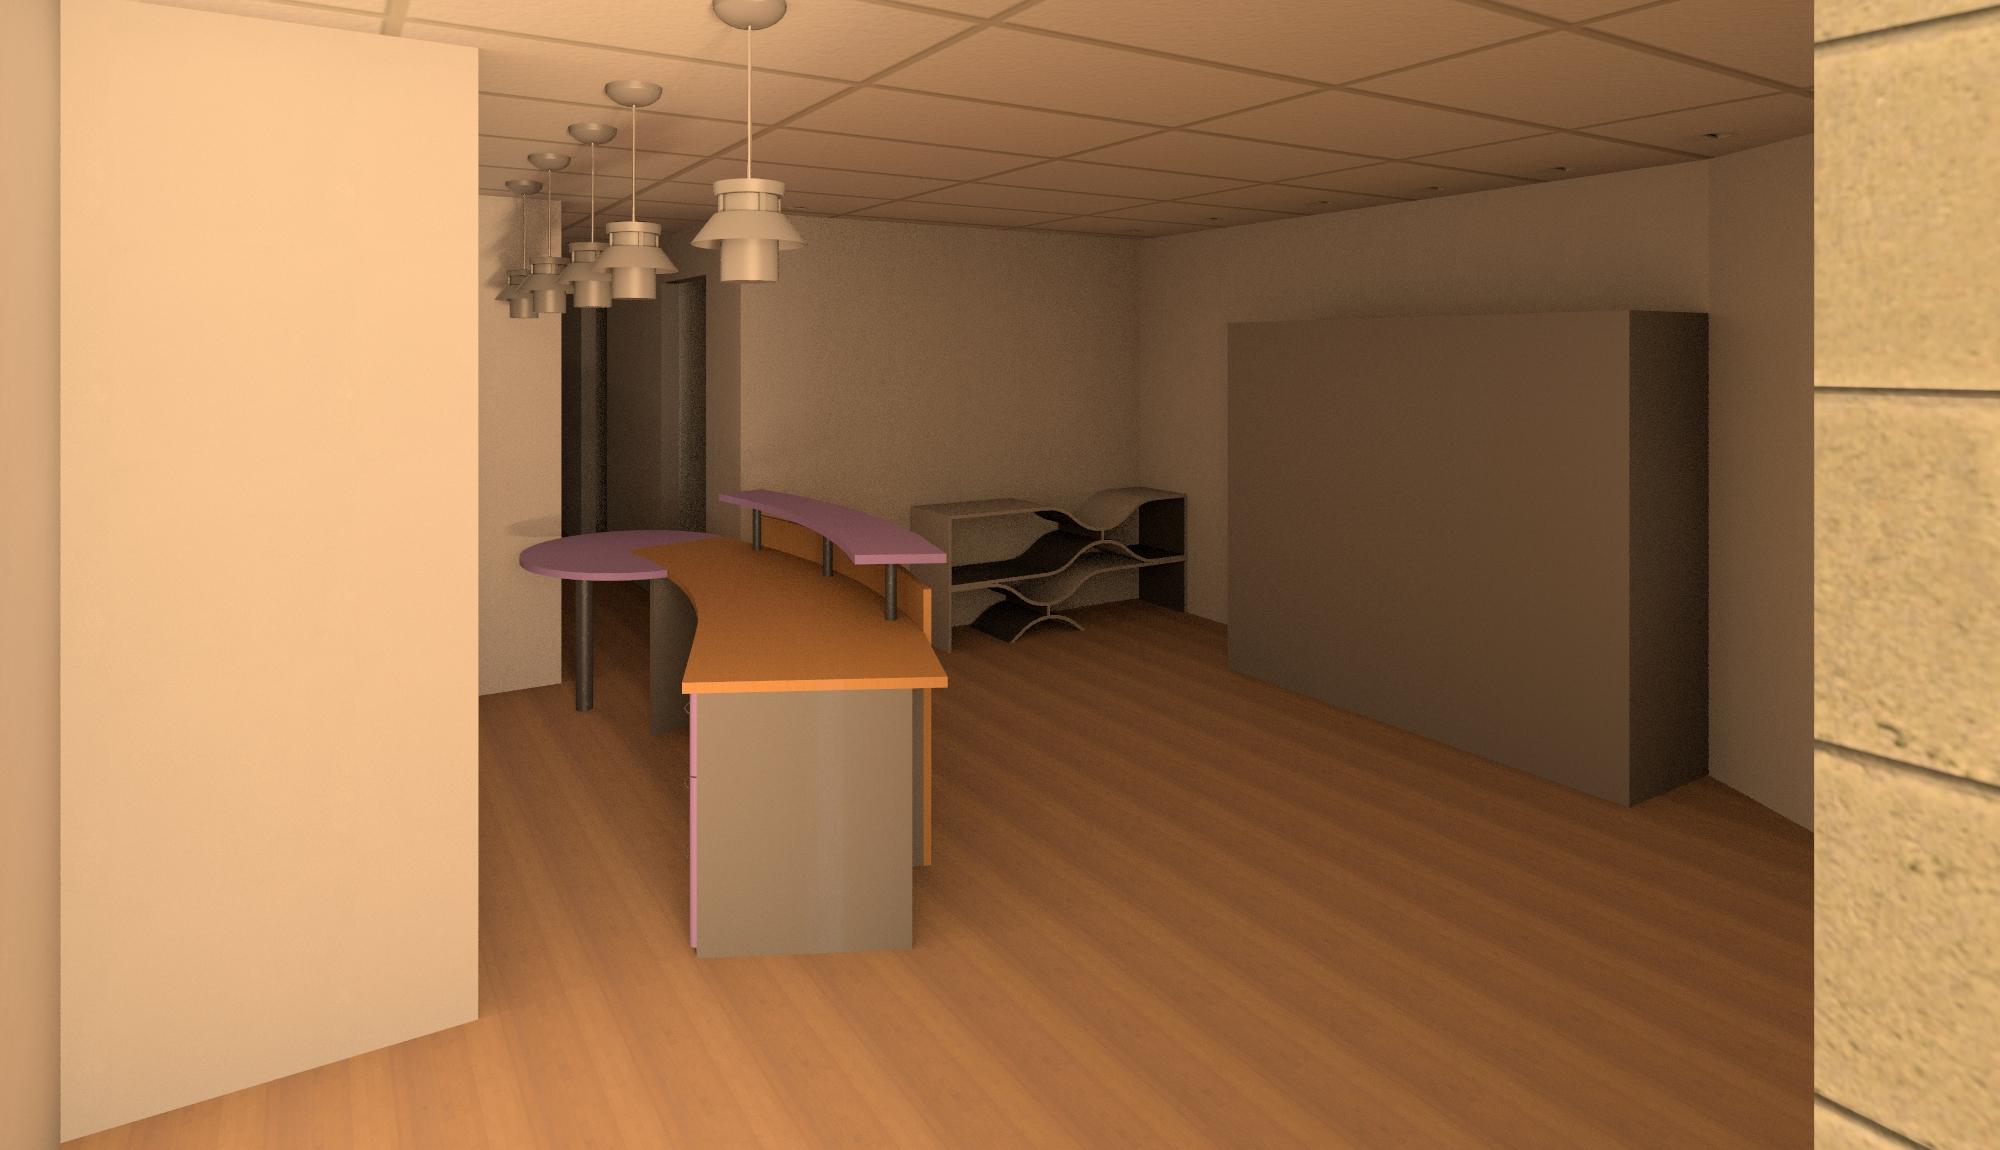 Project1_Birkum_Hot_Yoga_Hyattsville.rvt_2013-Mar-25_09-18-53PM-000_3D_View_1_Yoga_Studio_Second_Floor_Retail_Space_View_1.jpg